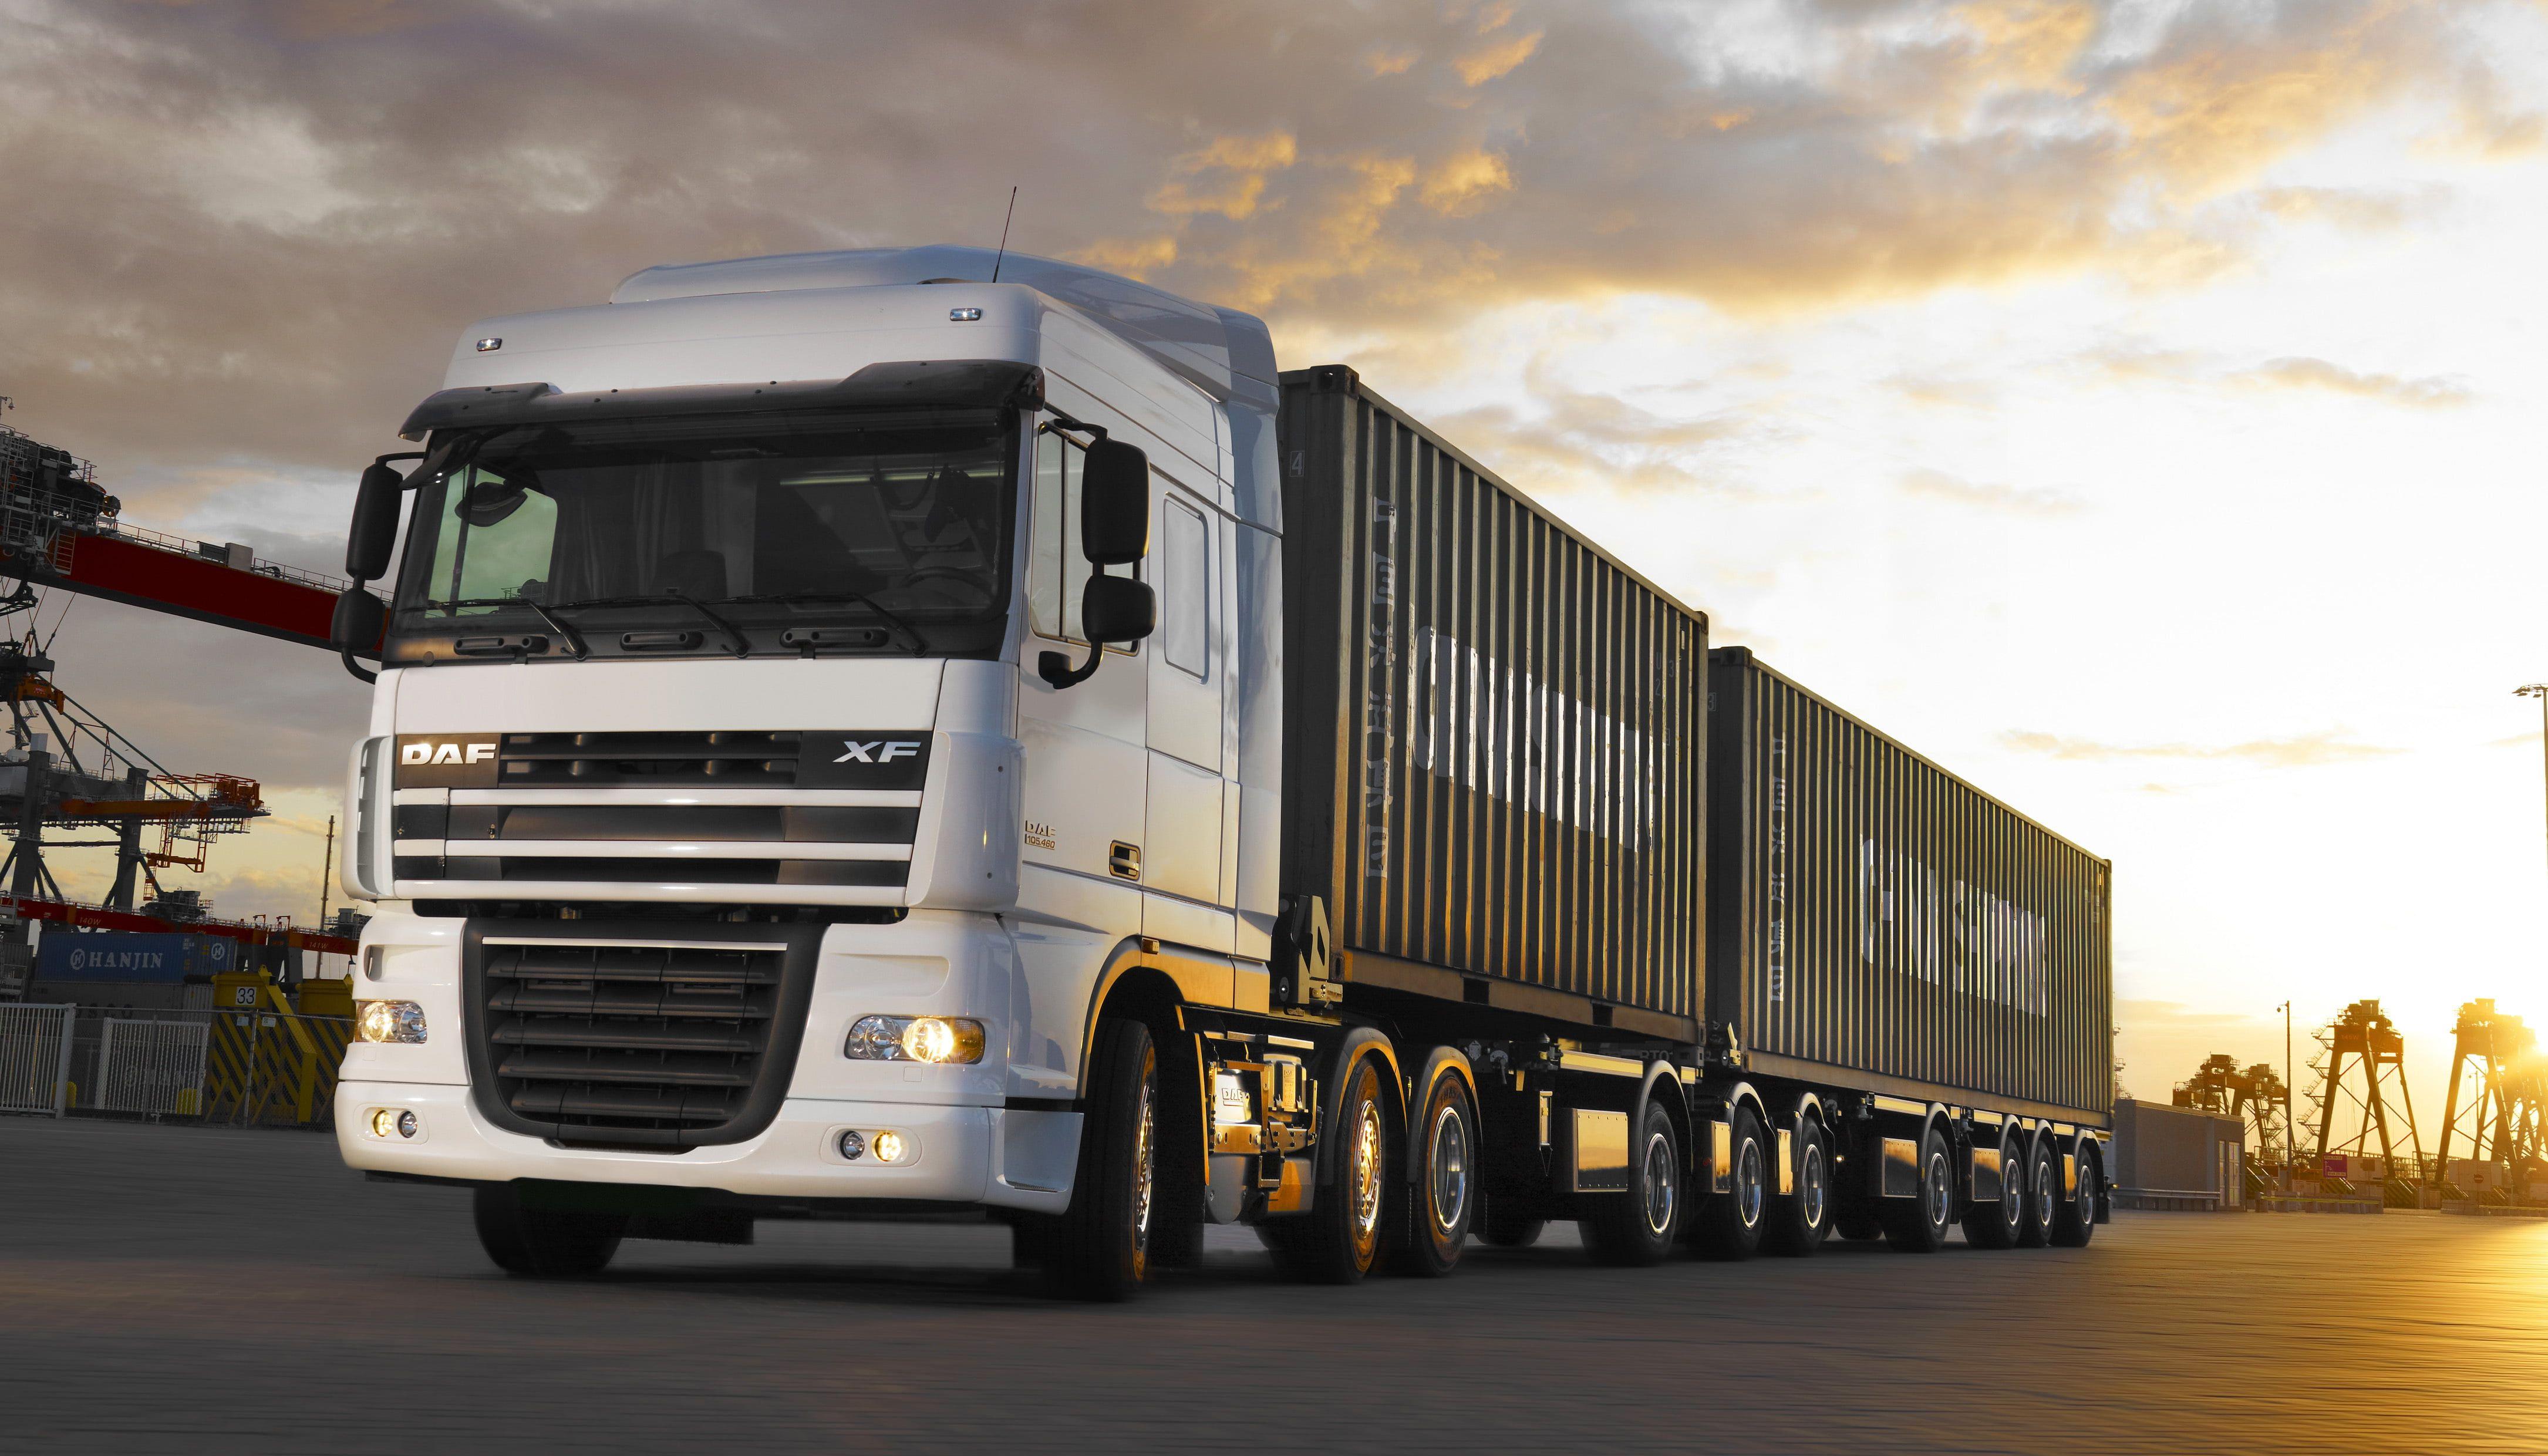 Black And White Freight Truck Truck Daf Xf105 A Container Ship Cranes 4k Wallpaper Hdwallpaper Desktop Trasporti Auto